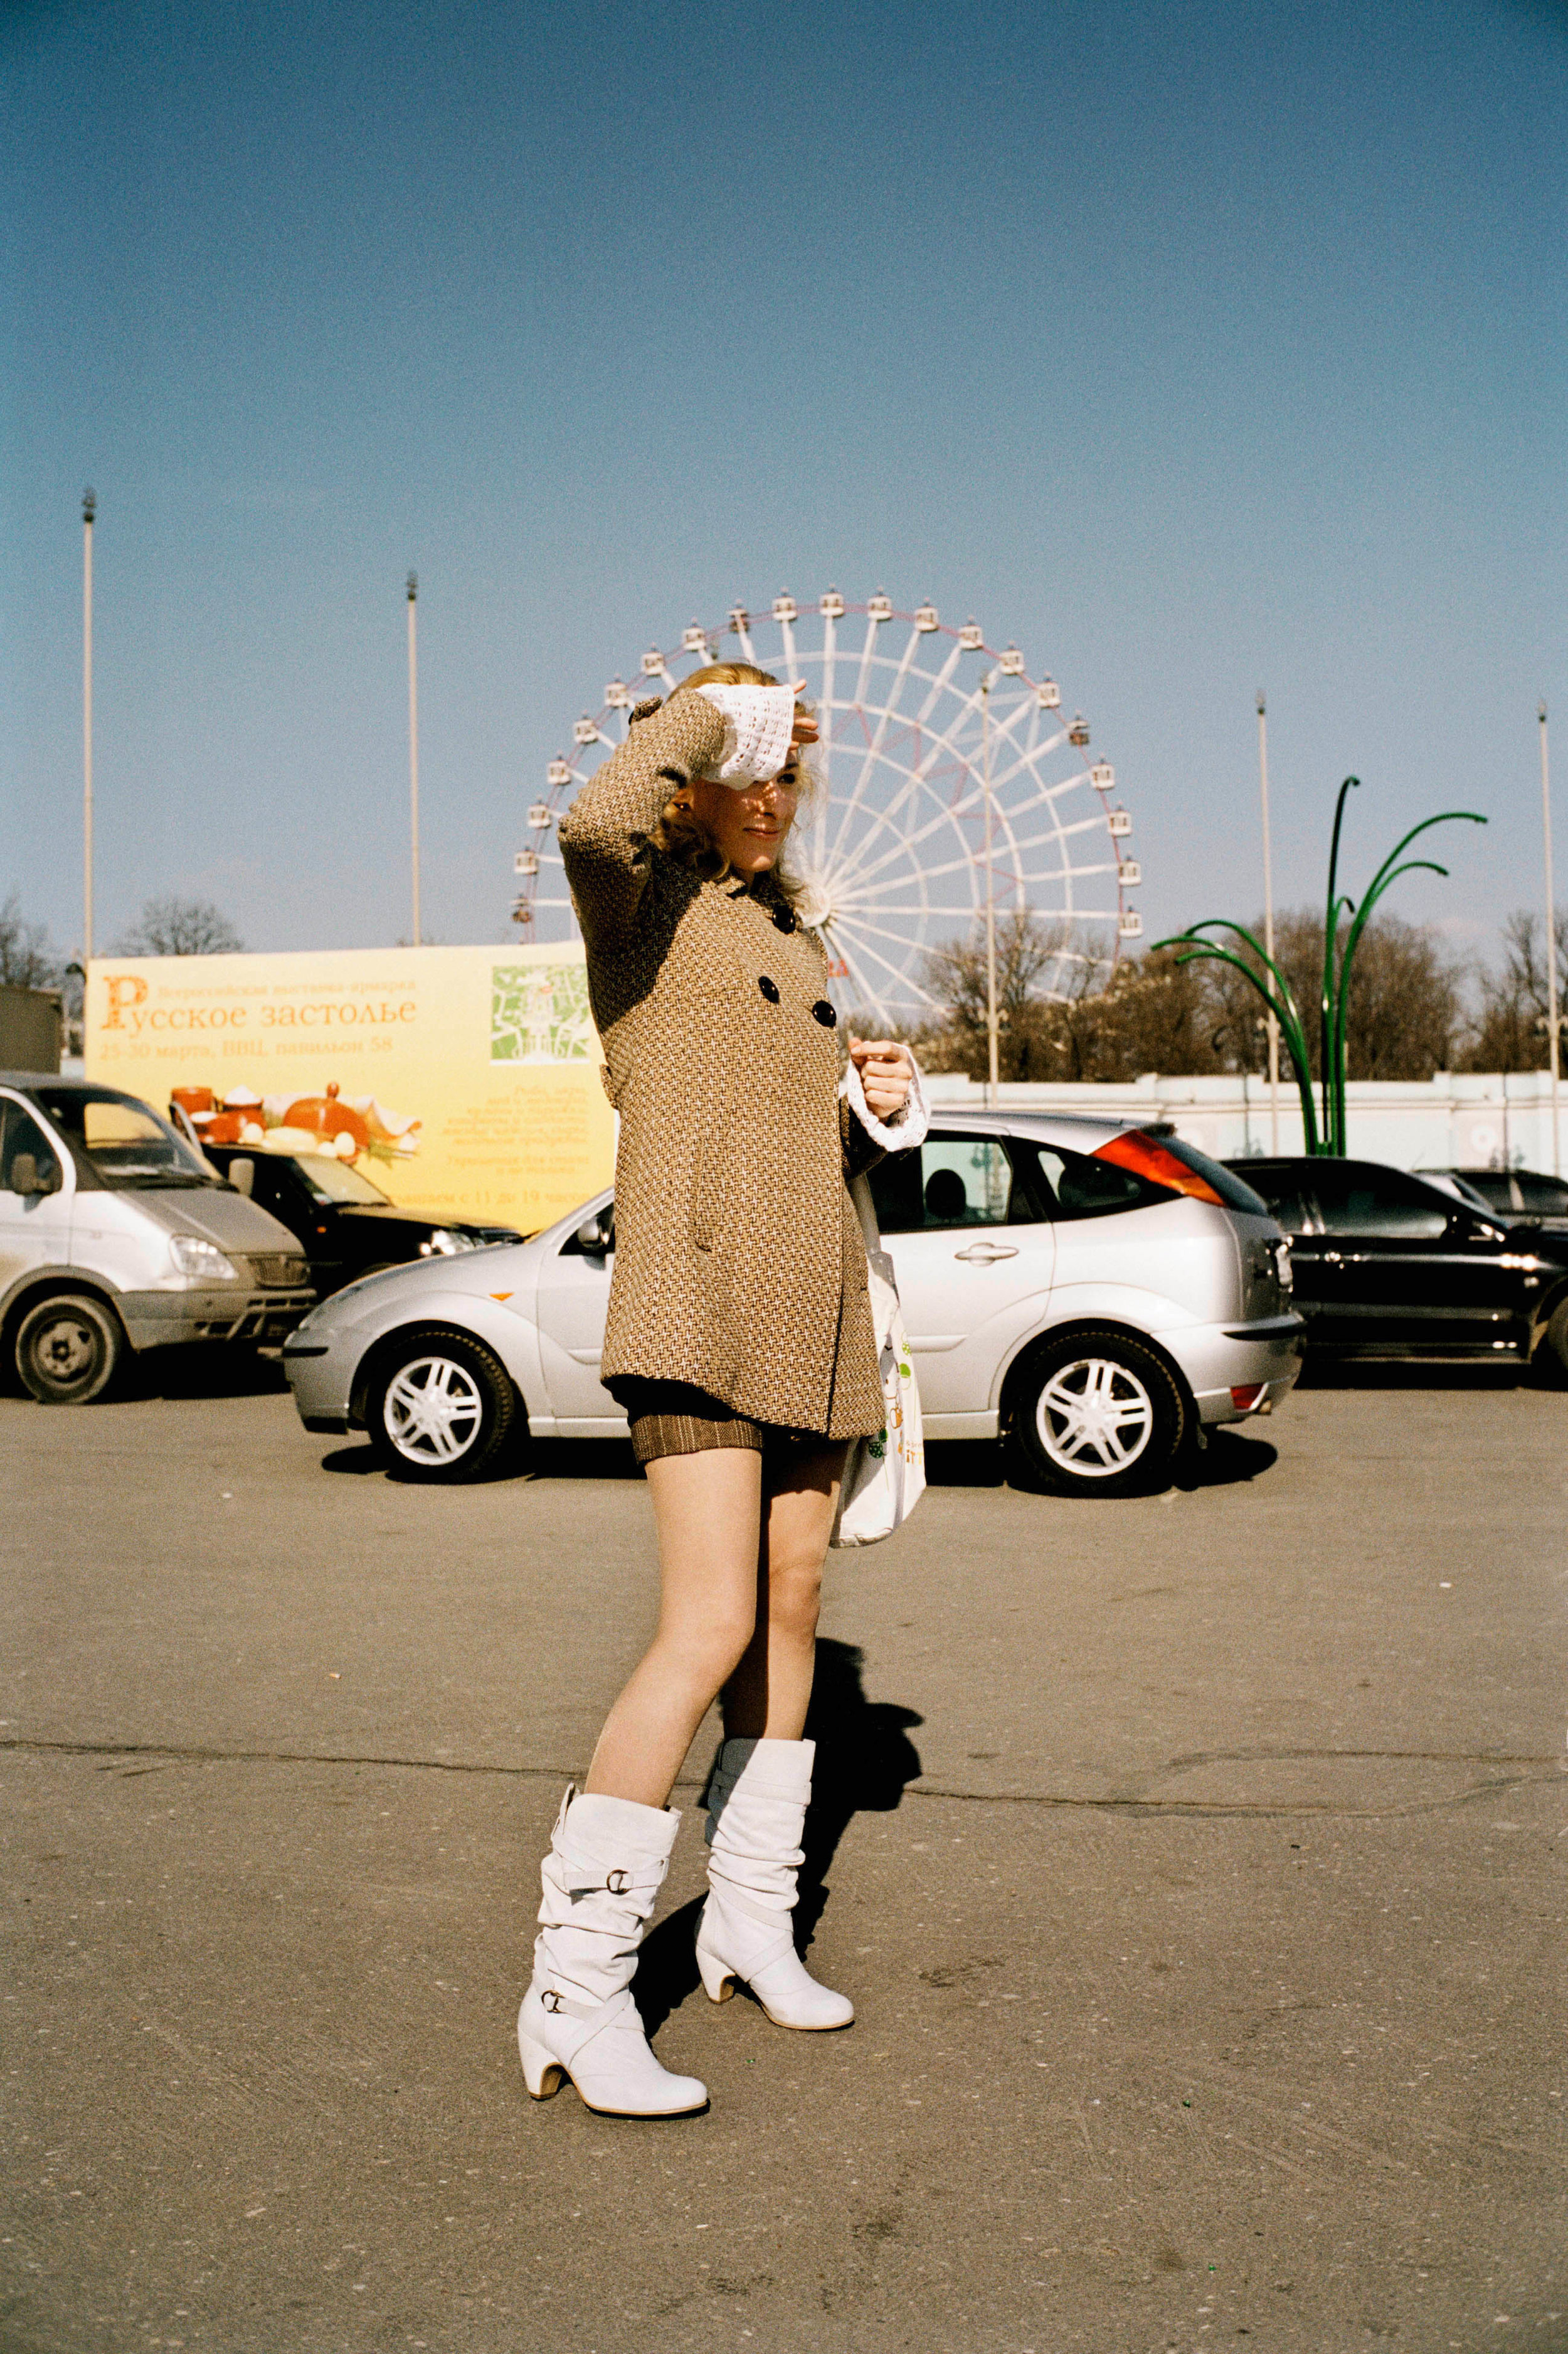 Andreas Herzau, Girl, aus der Serie: Moscow Street, 2008. Courtesy of Andreas Herzau / Galerie SOIZ Copyright © Andreas Herzau / courtesy Galerie SOIZ